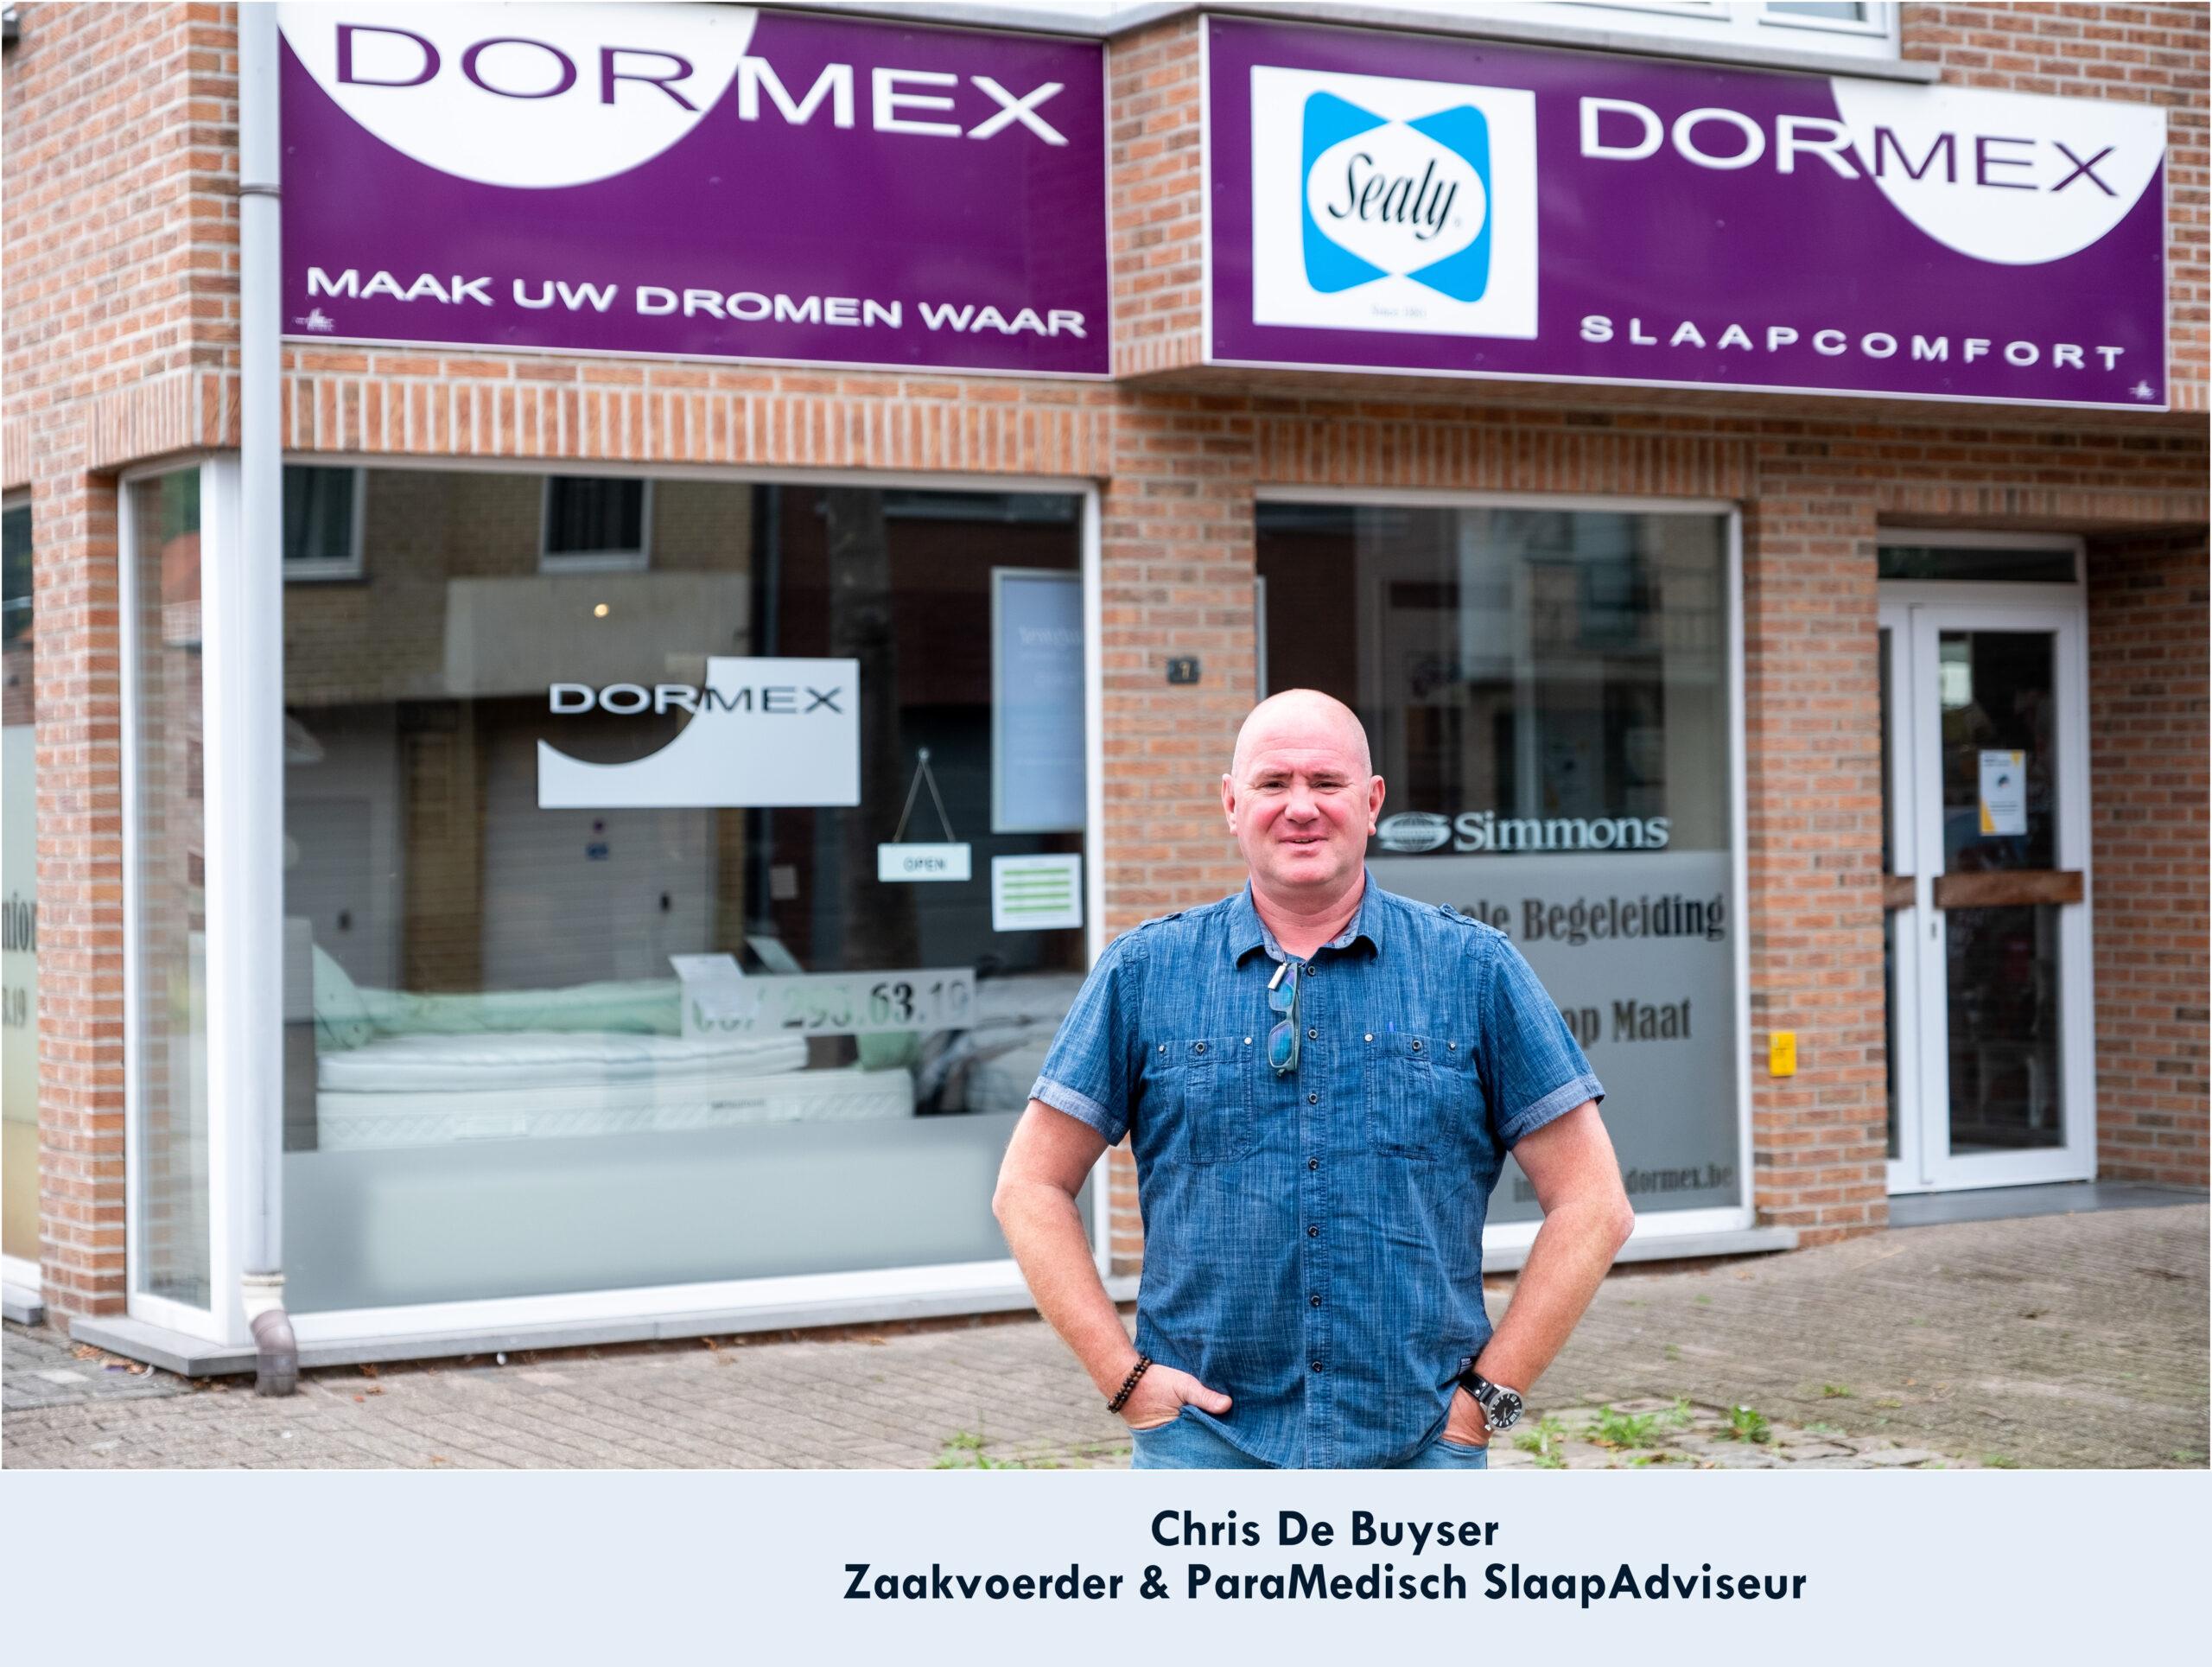 Dormex Foto